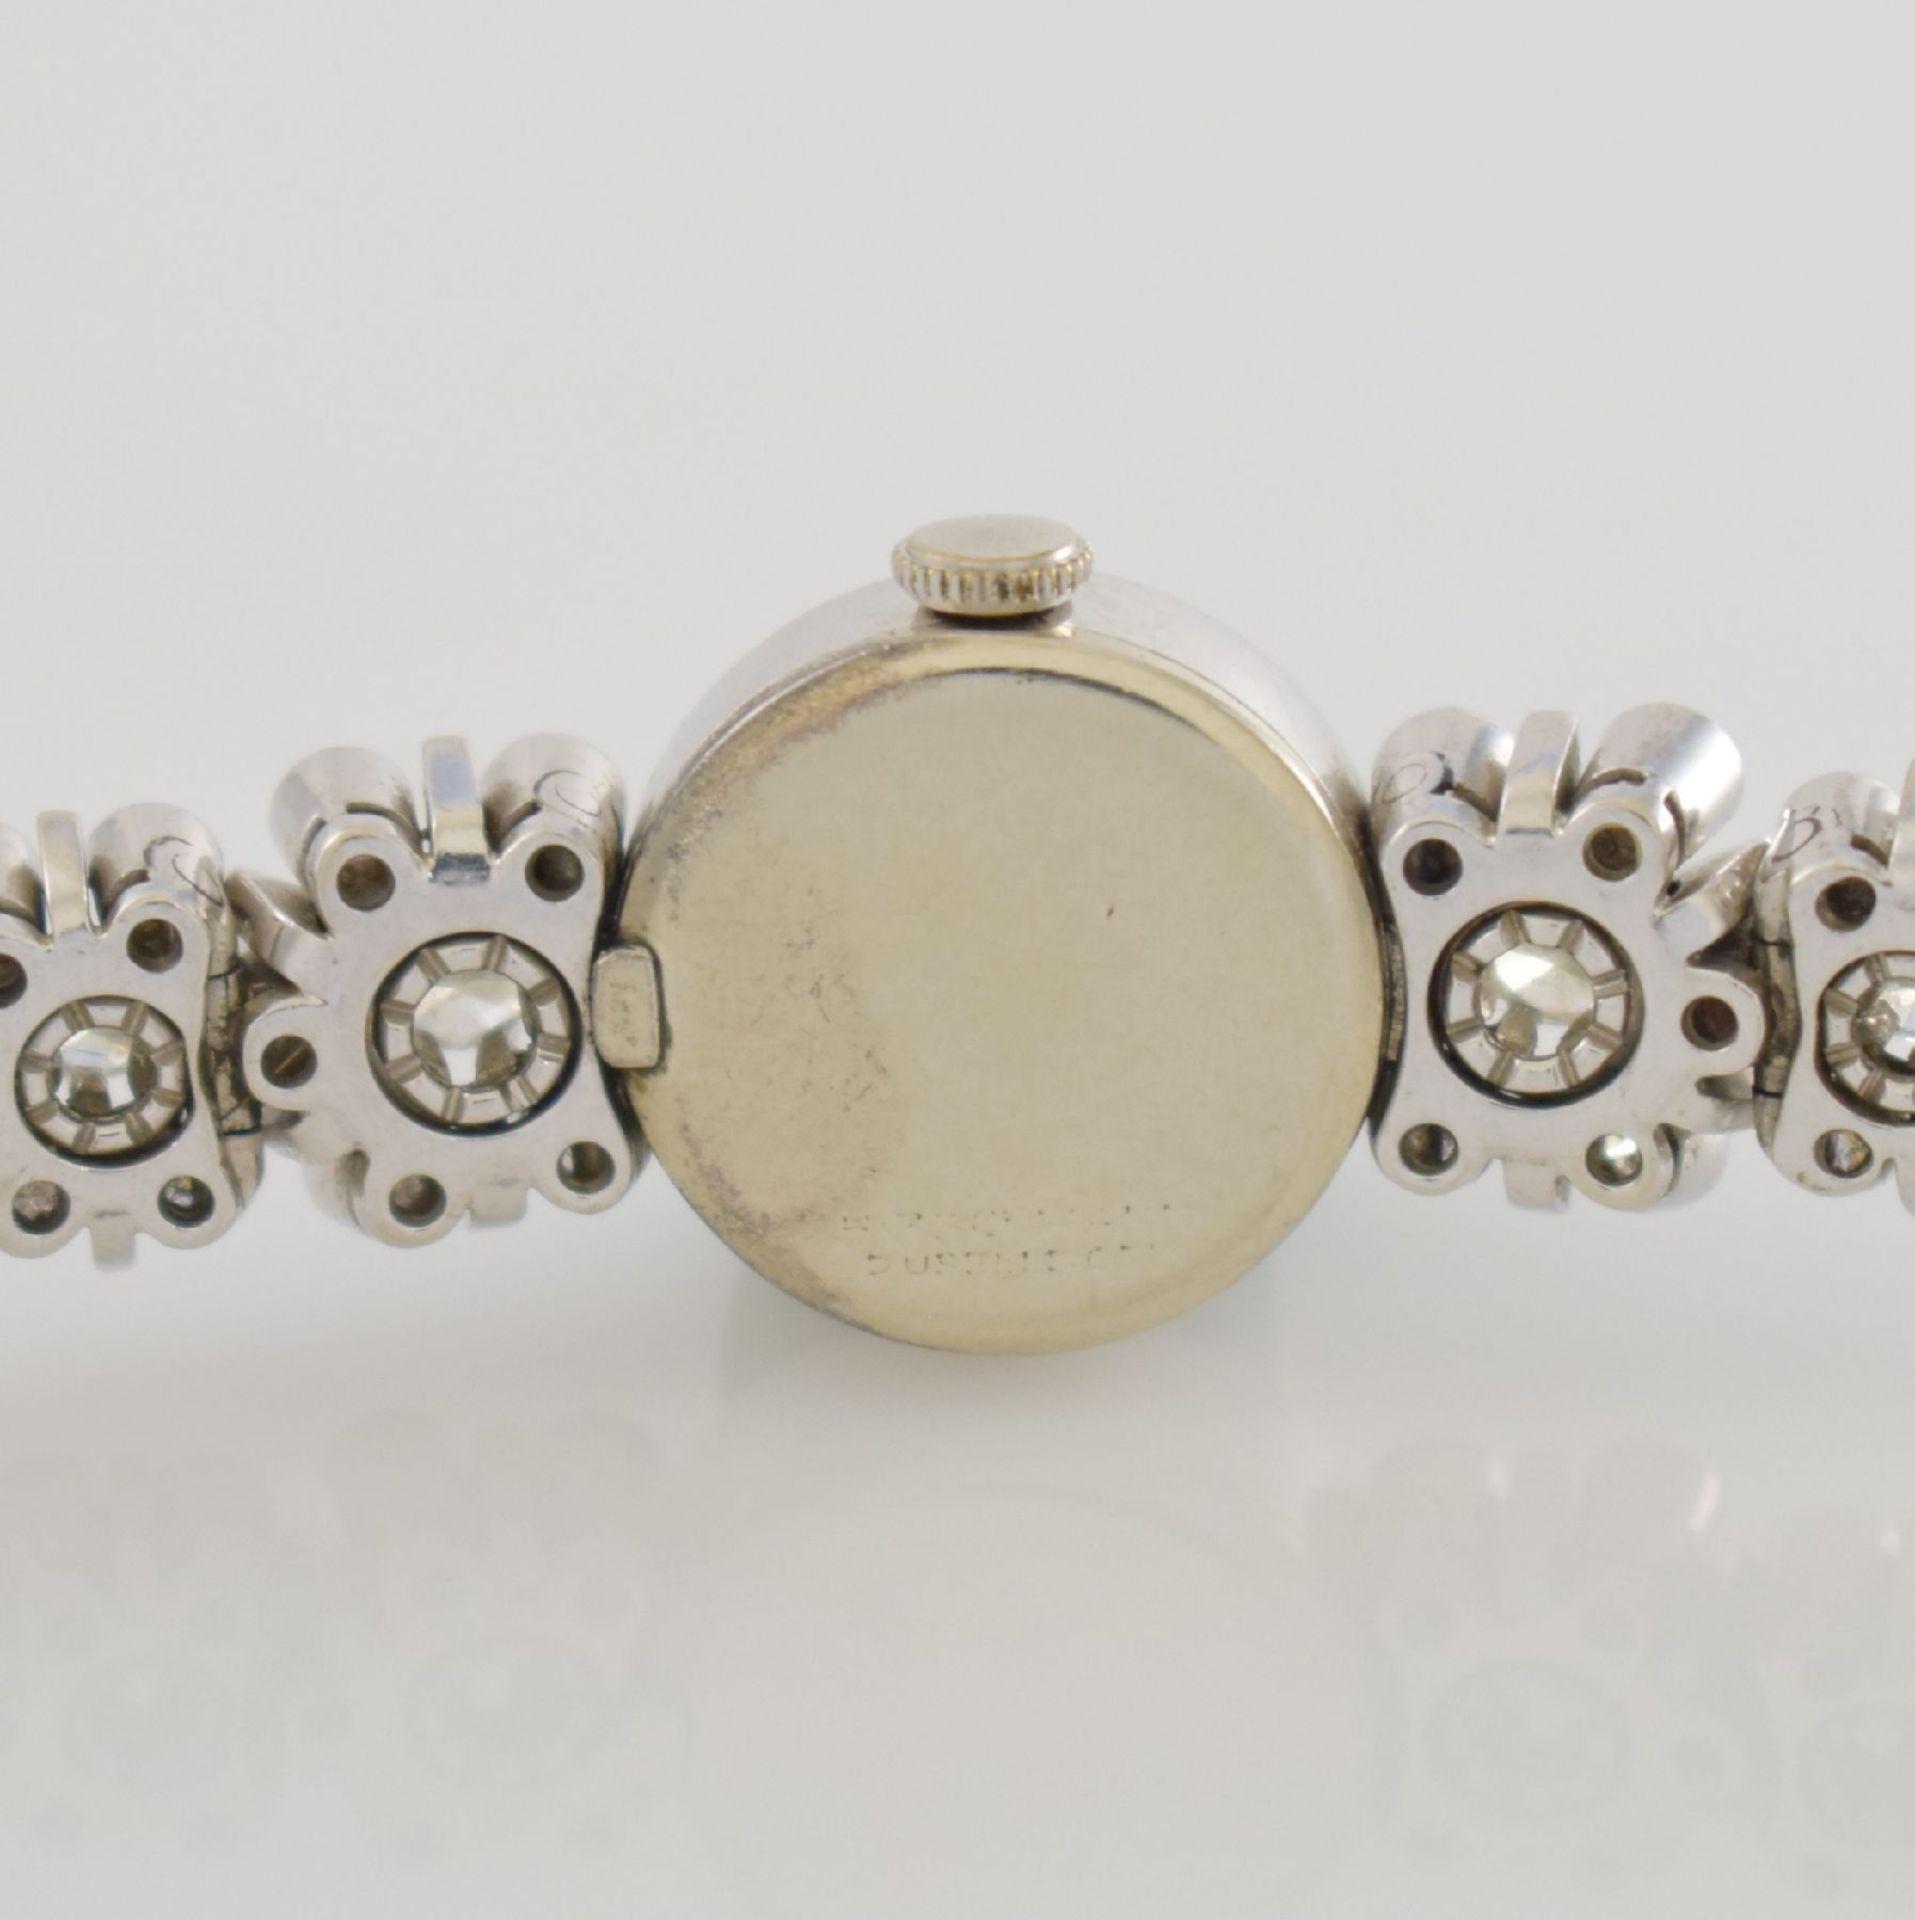 MARVIN Art Deco ausgefallene Damenarmbanduhr in WG 585/000 m. Diamanten zus. ca. 2,50 ct, Schweiz um - Bild 5 aus 5